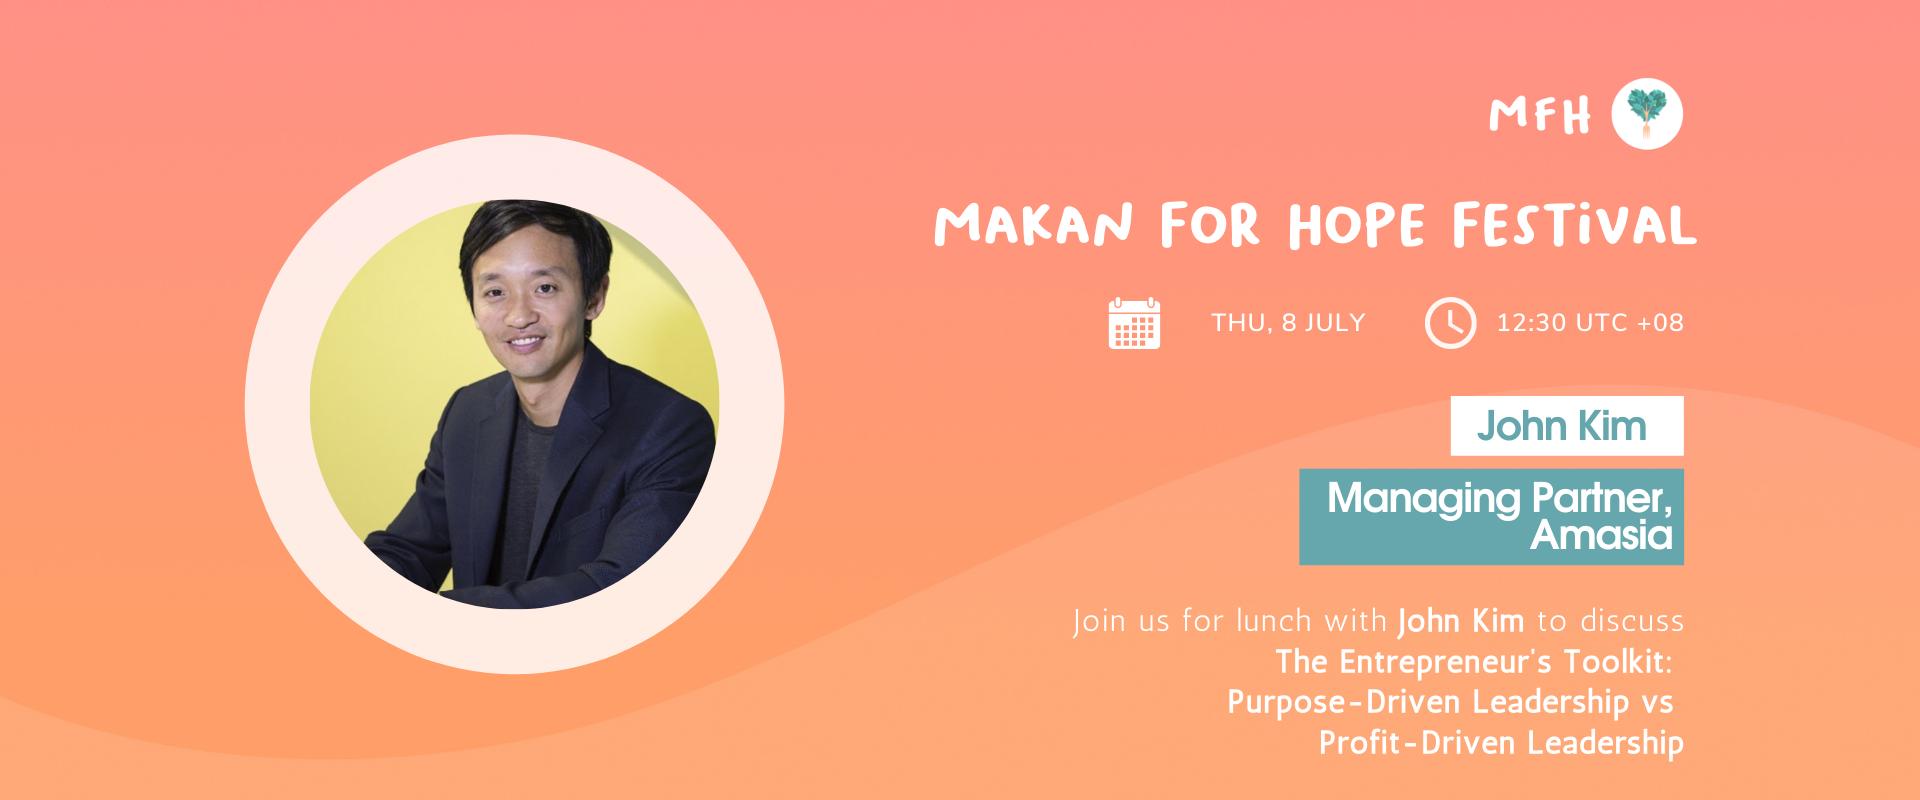 John Kim - The Entrepreneur's Toolkit: Purpose-driven Leadership in Startups